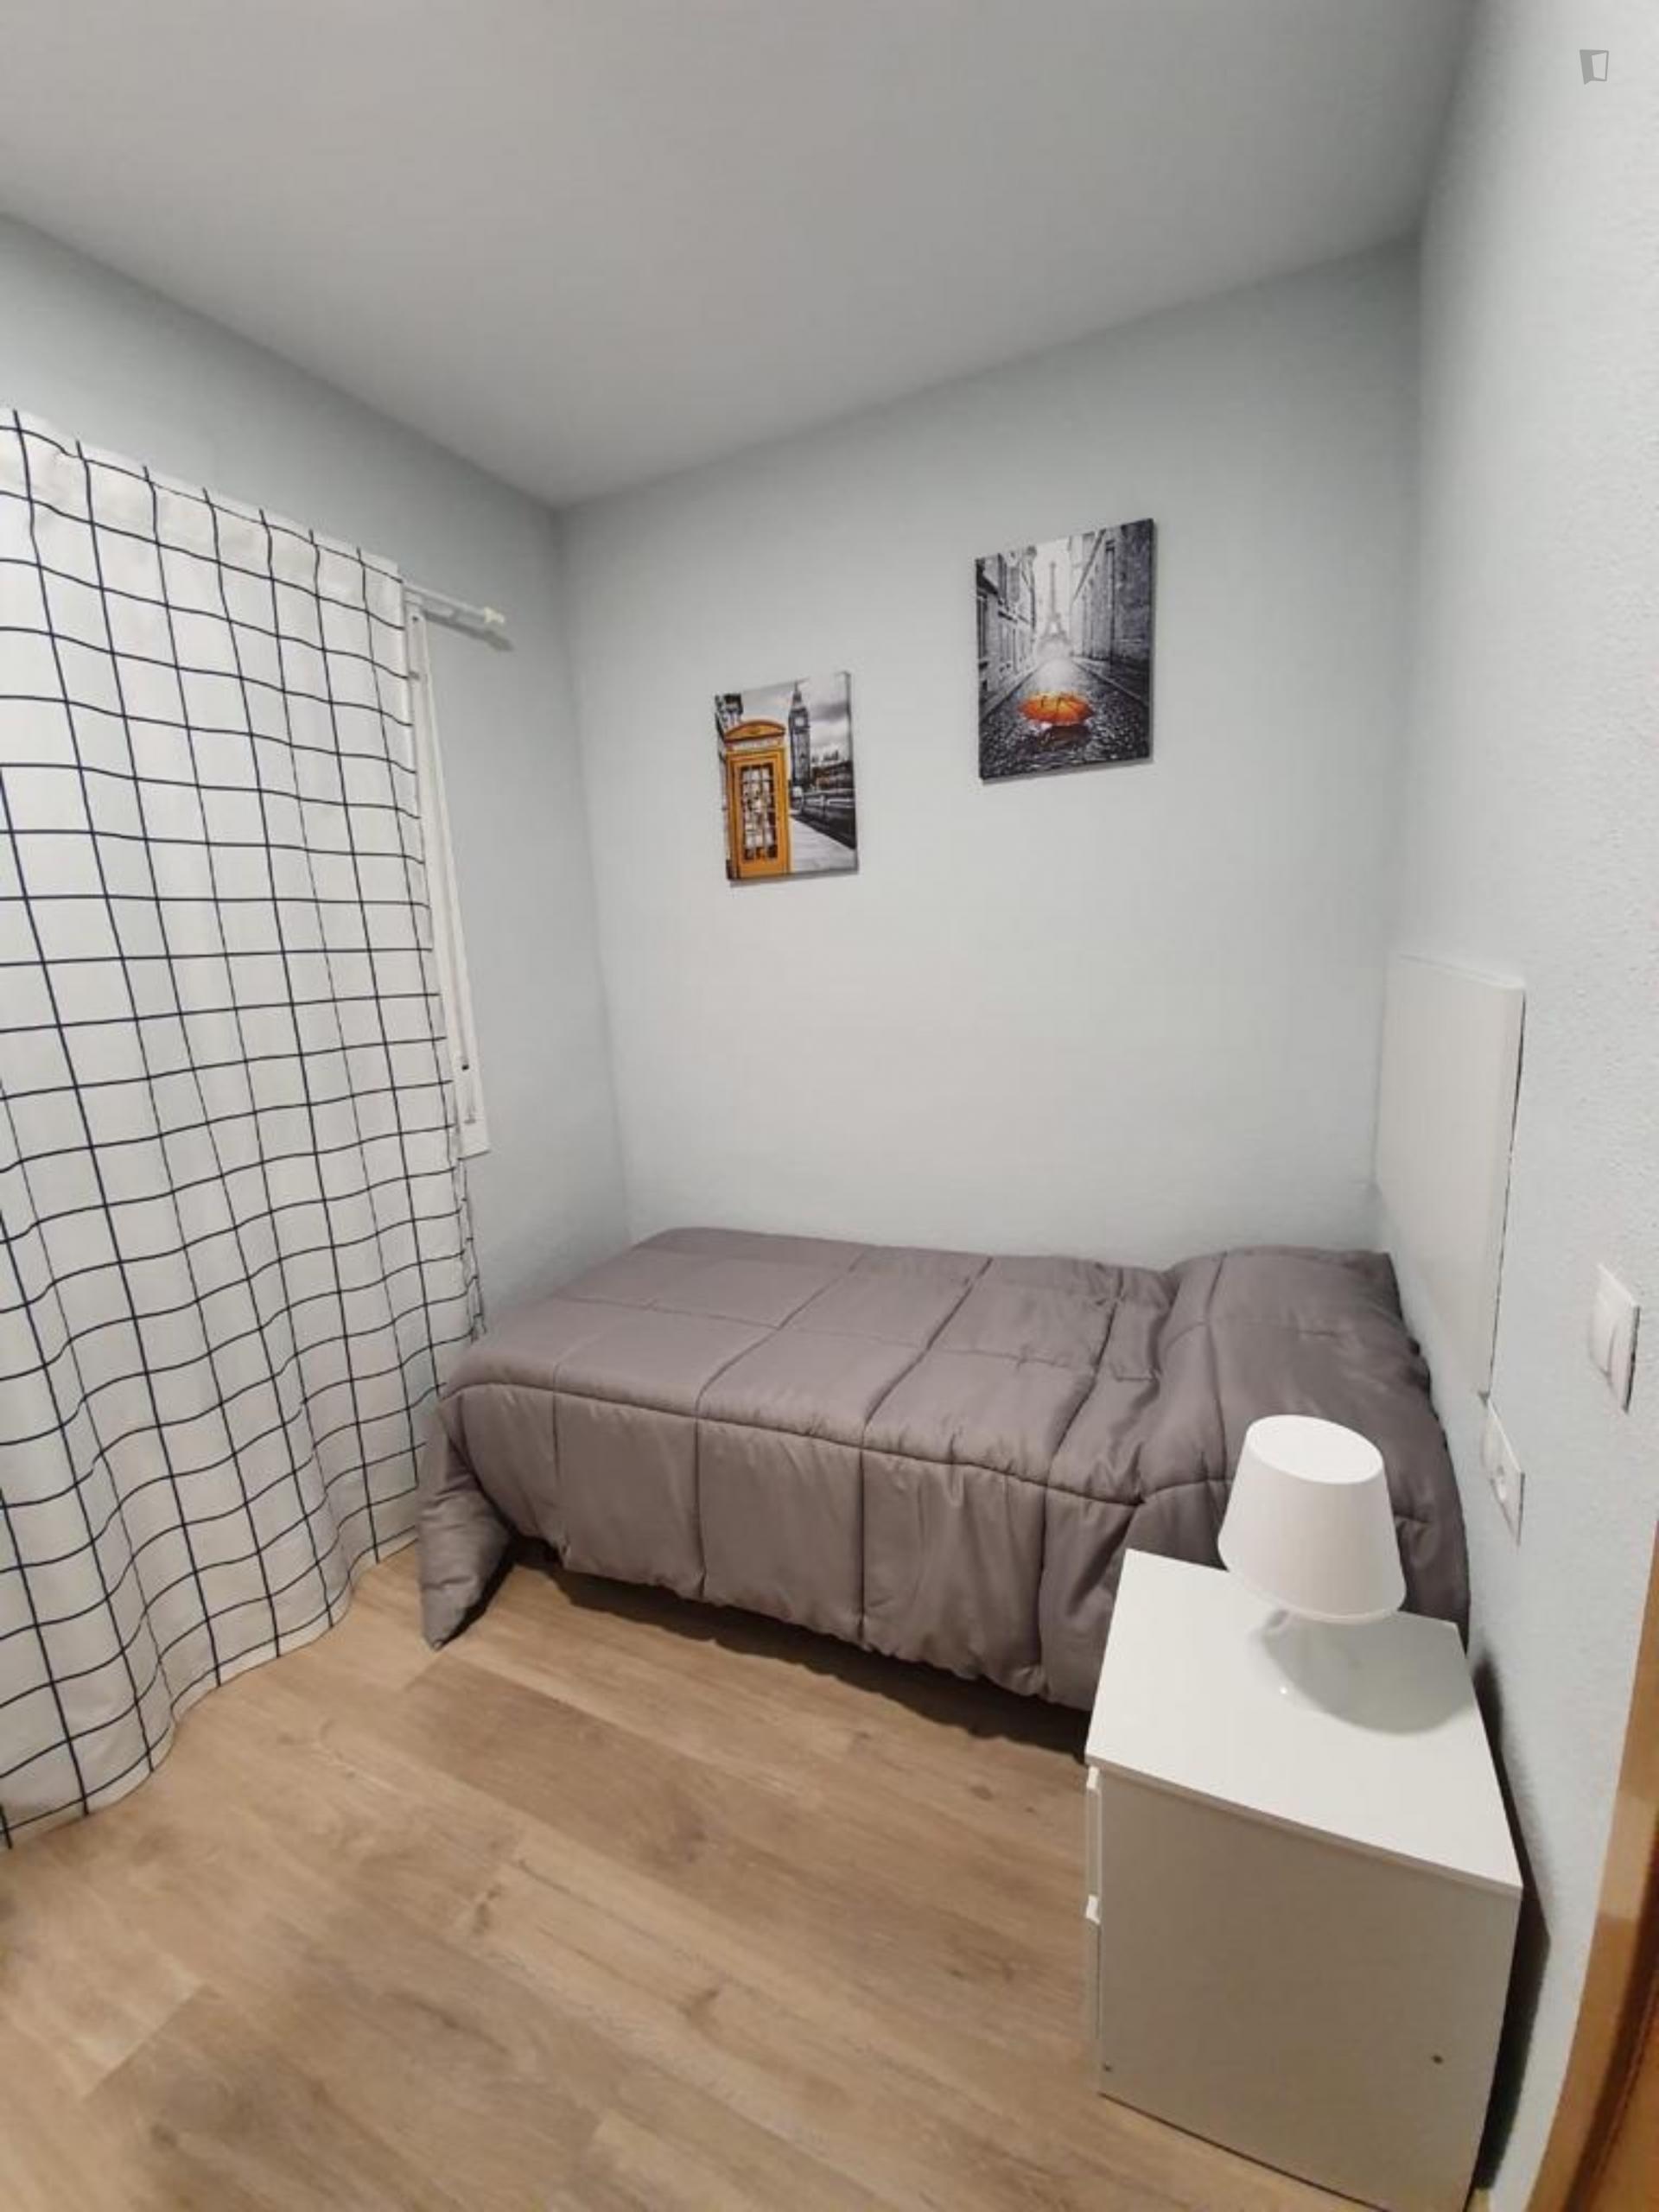 Barcelona - Spacious 3 bedroom apartment in Malaga